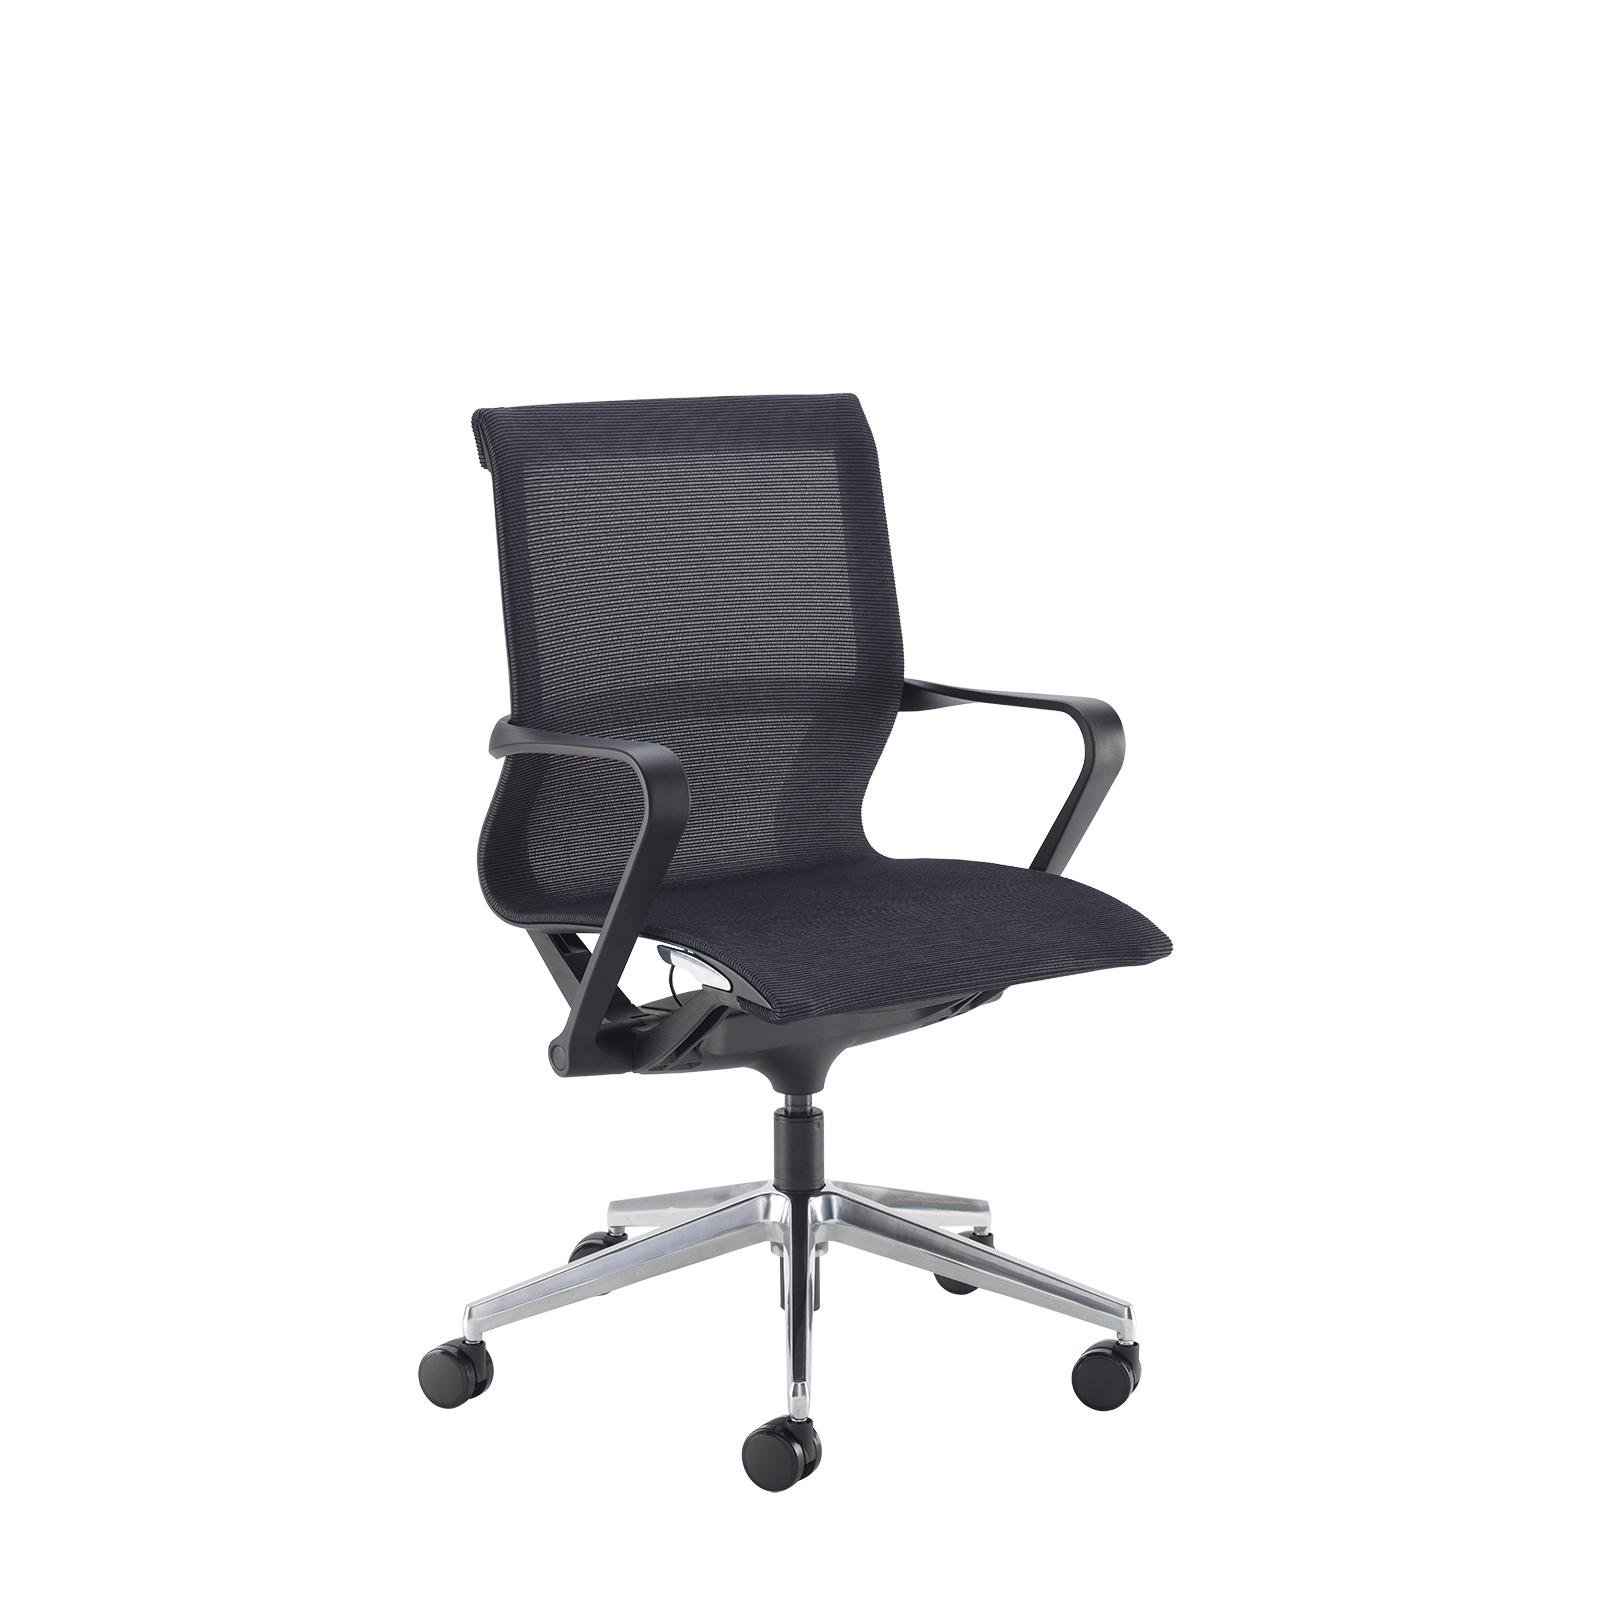 Lola medium back designer operators chair with black mesh, black frame and aluminium base